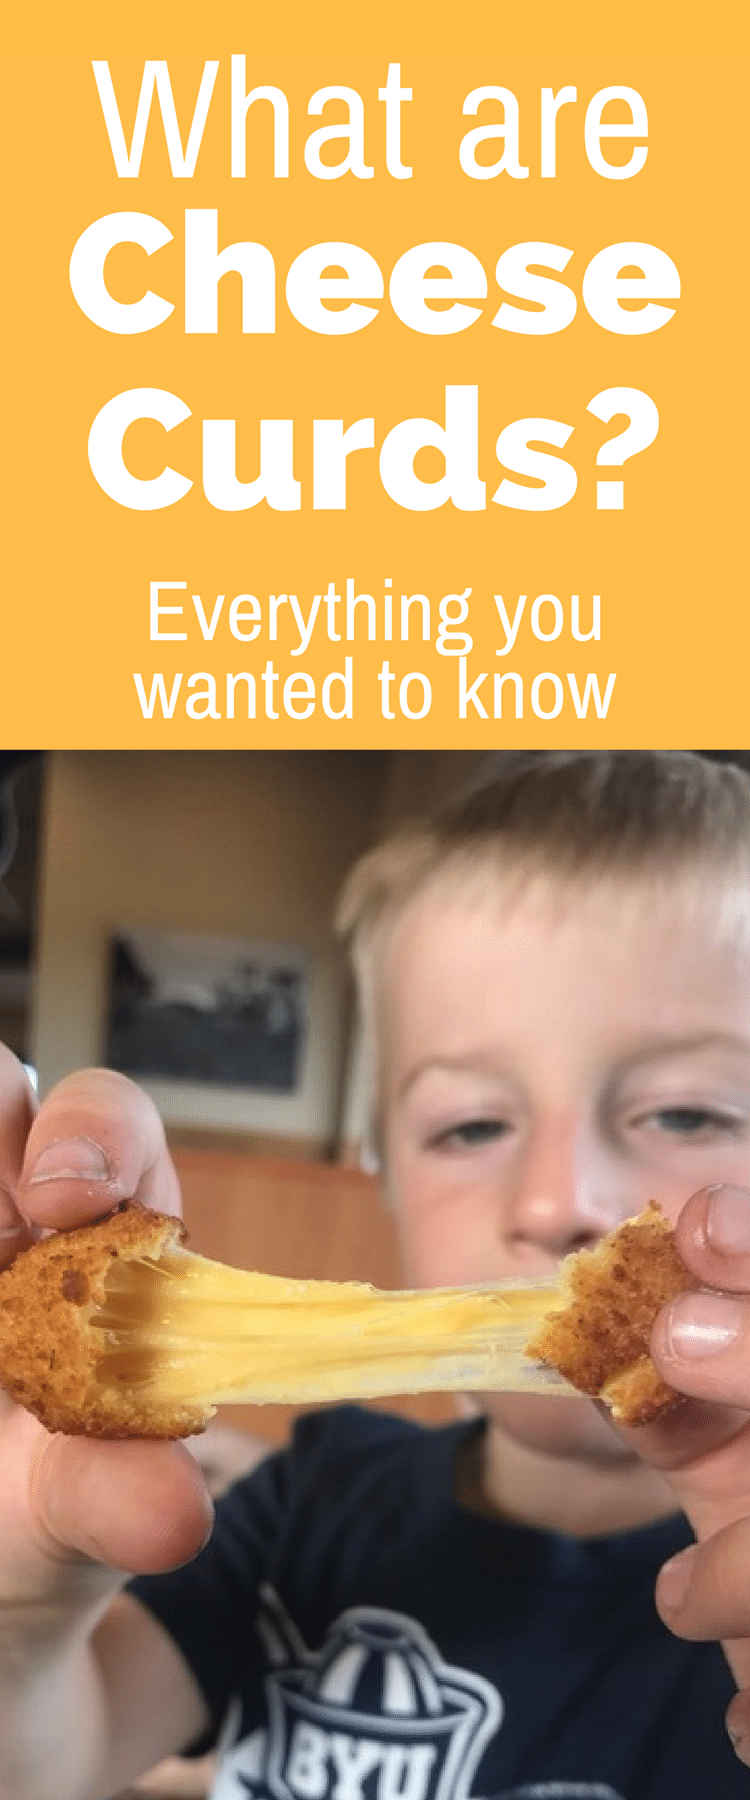 Cheese Curds / Fried Cheese Curds / Cheese Curd